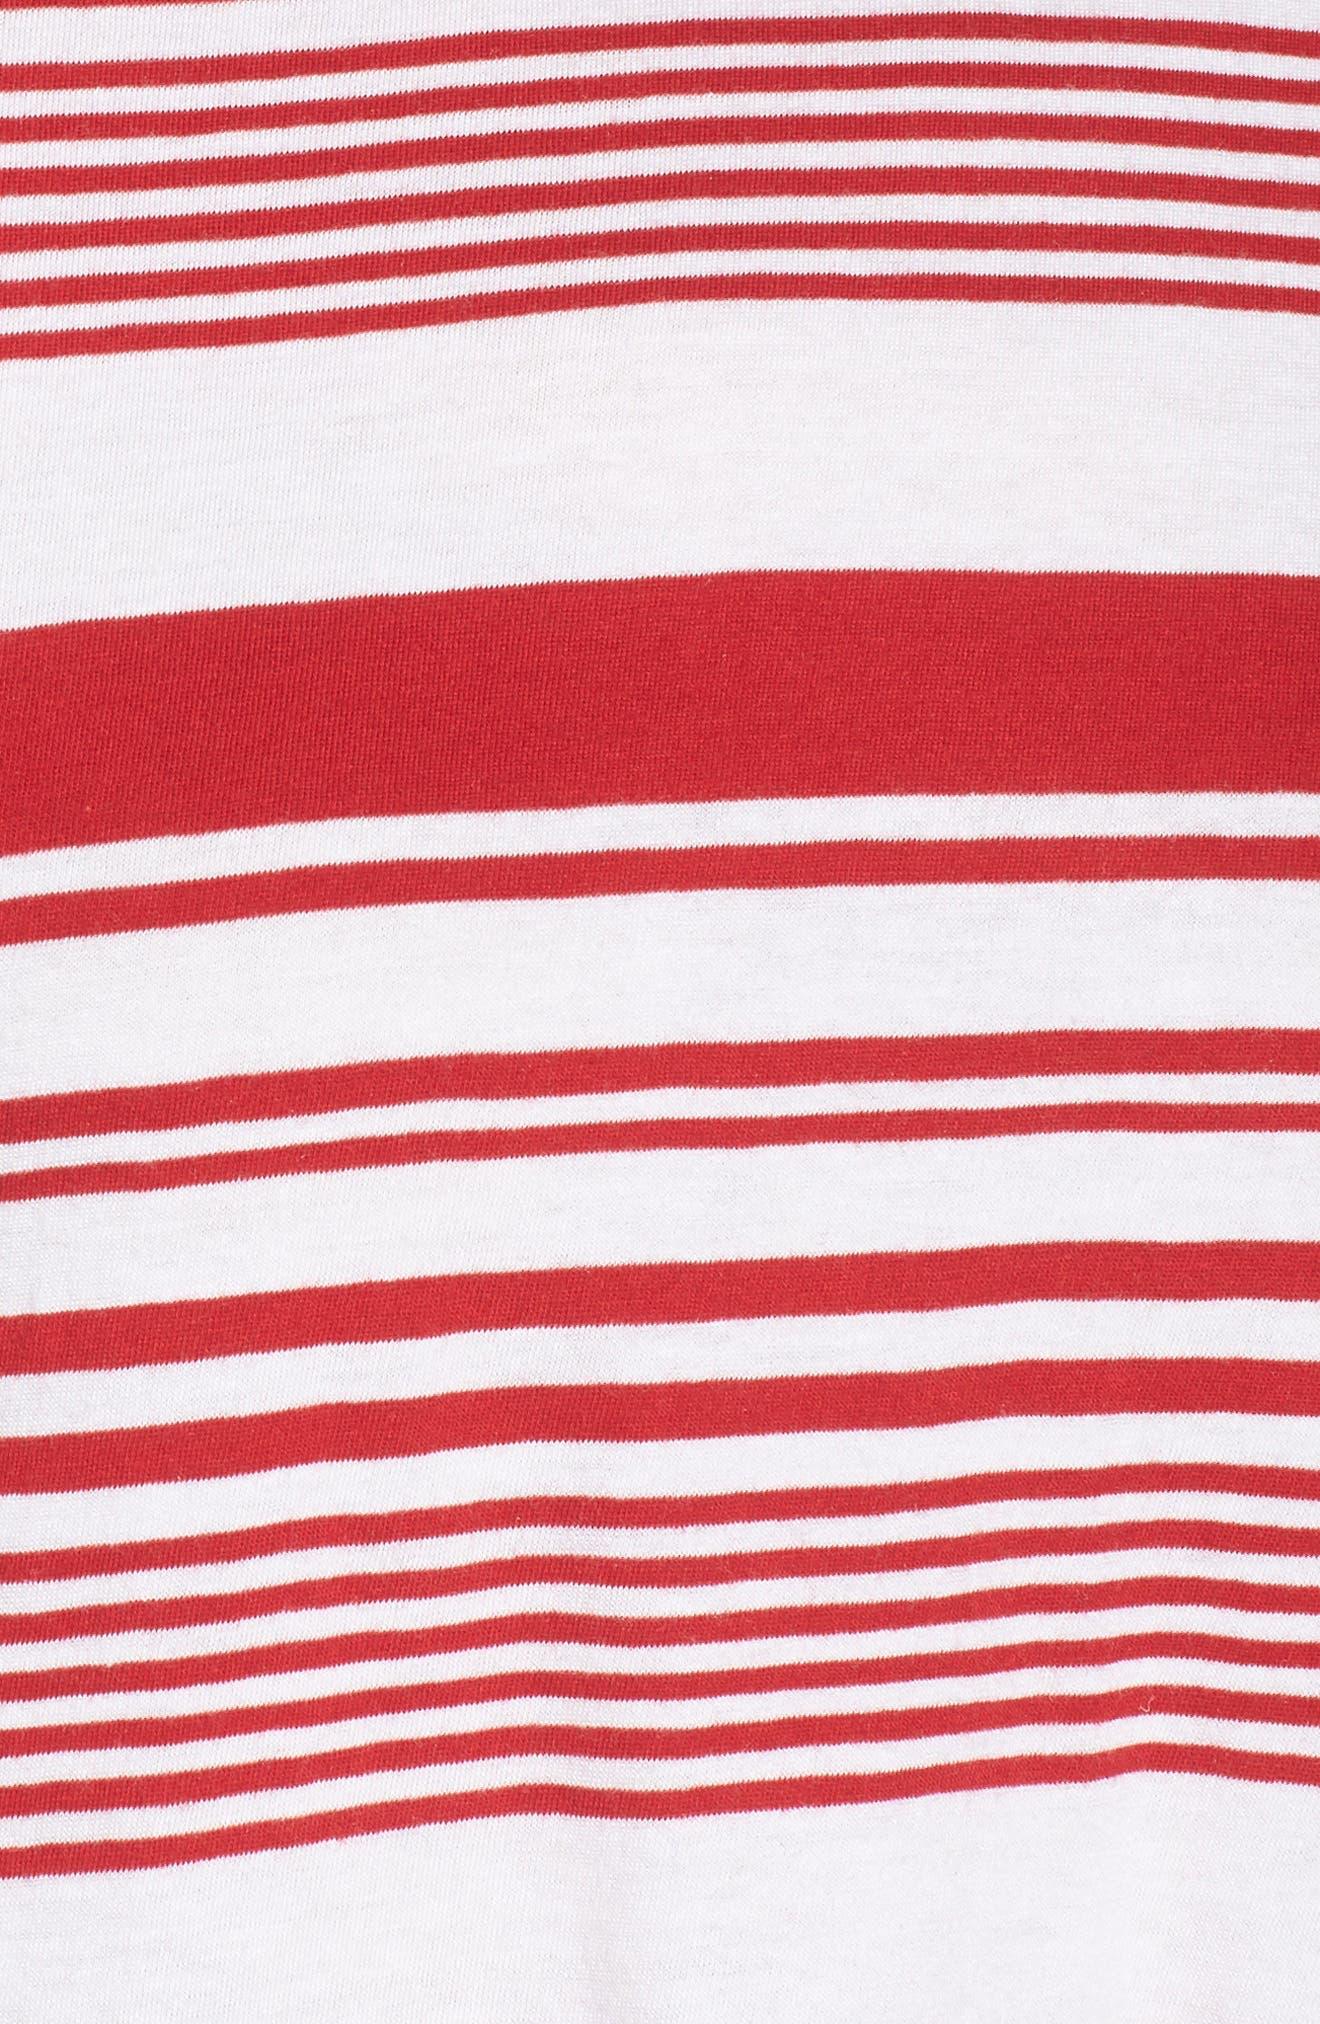 Twist Back Tee,                             Alternate thumbnail 6, color,                             Red Couture Monaco Stripe